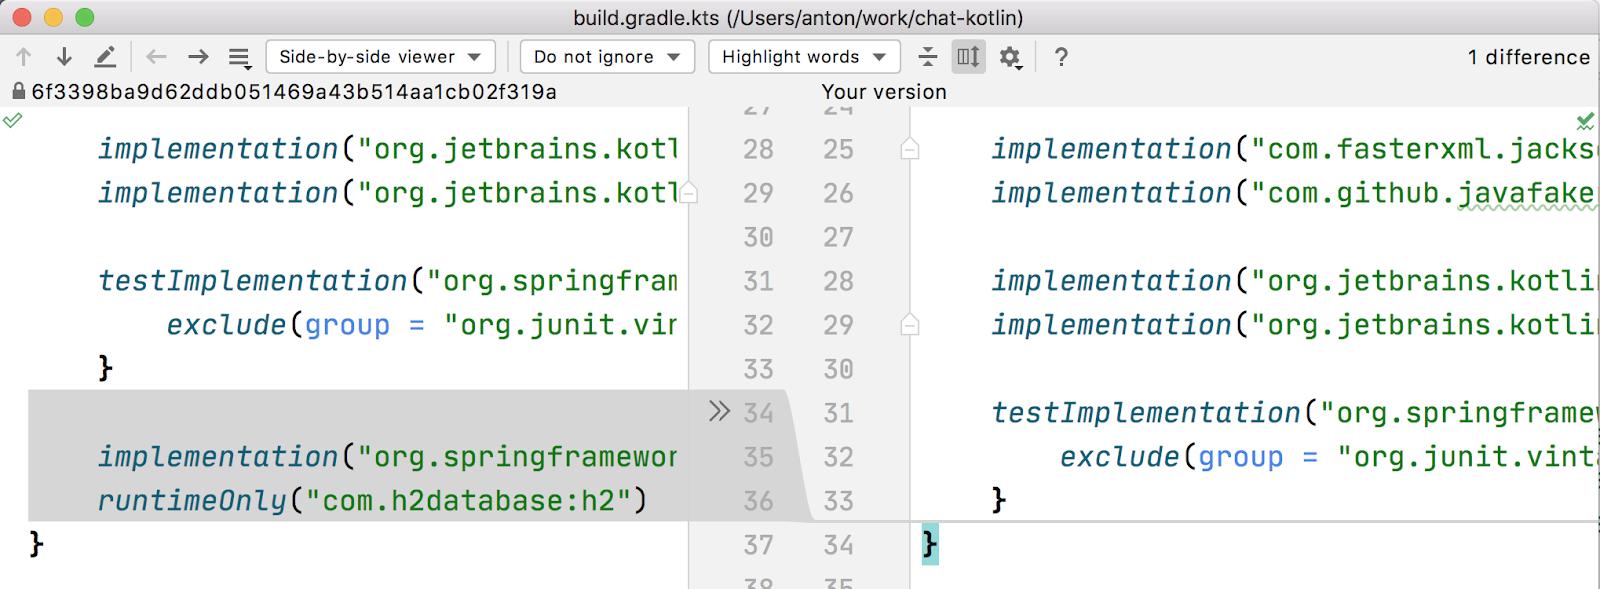 intellij git compare with branch file diff